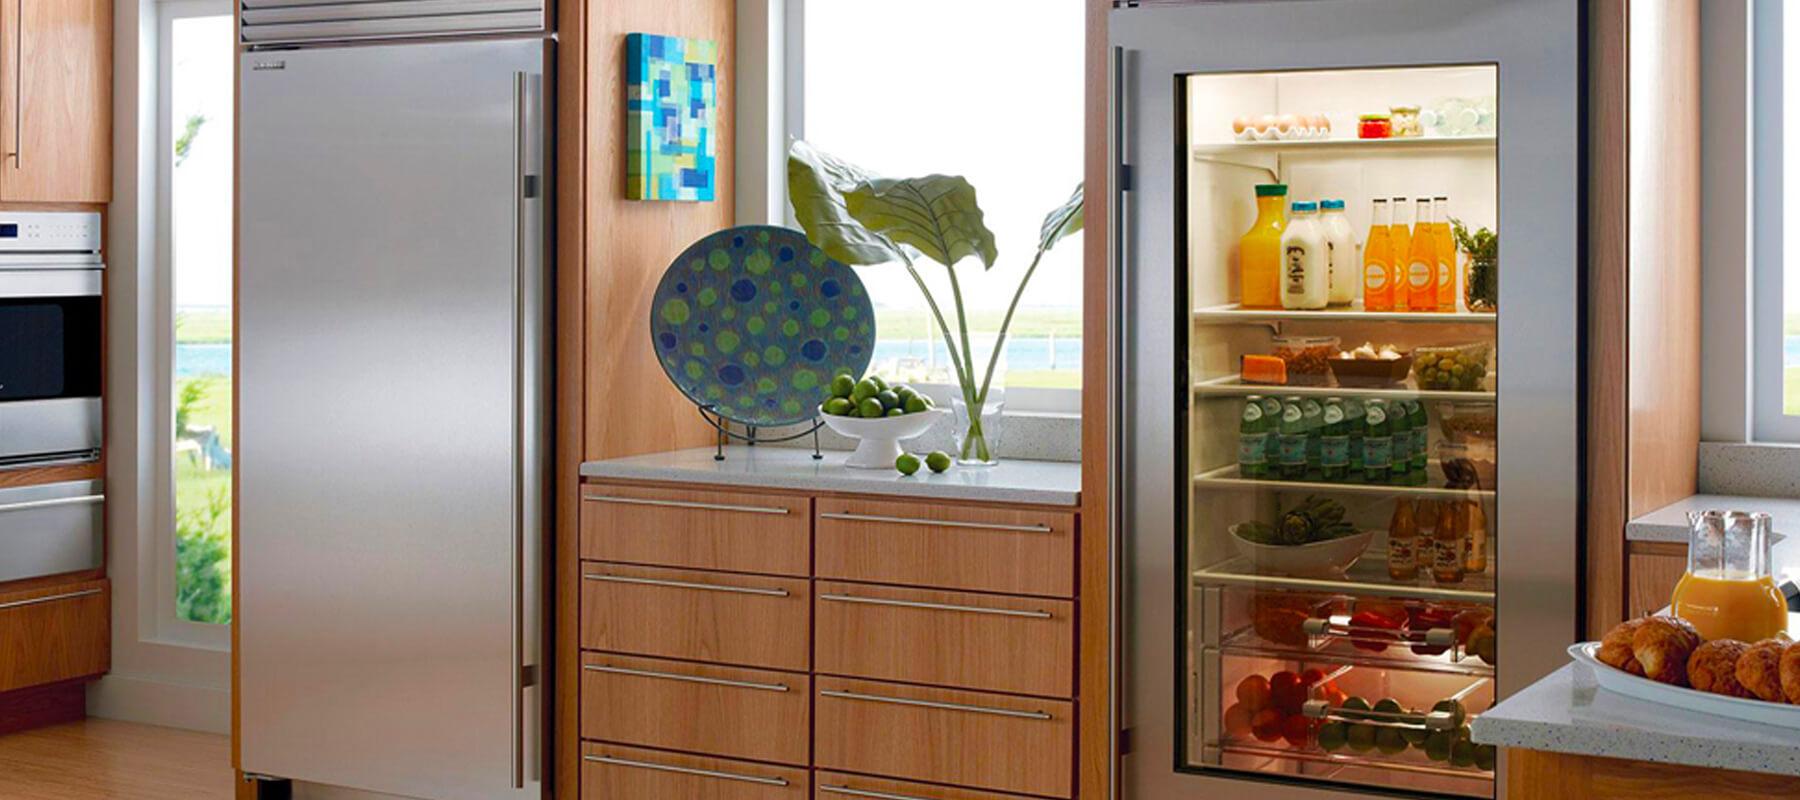 Built in Counter Depth Refrigerator San Diego   Built-in Refrigerator Repair